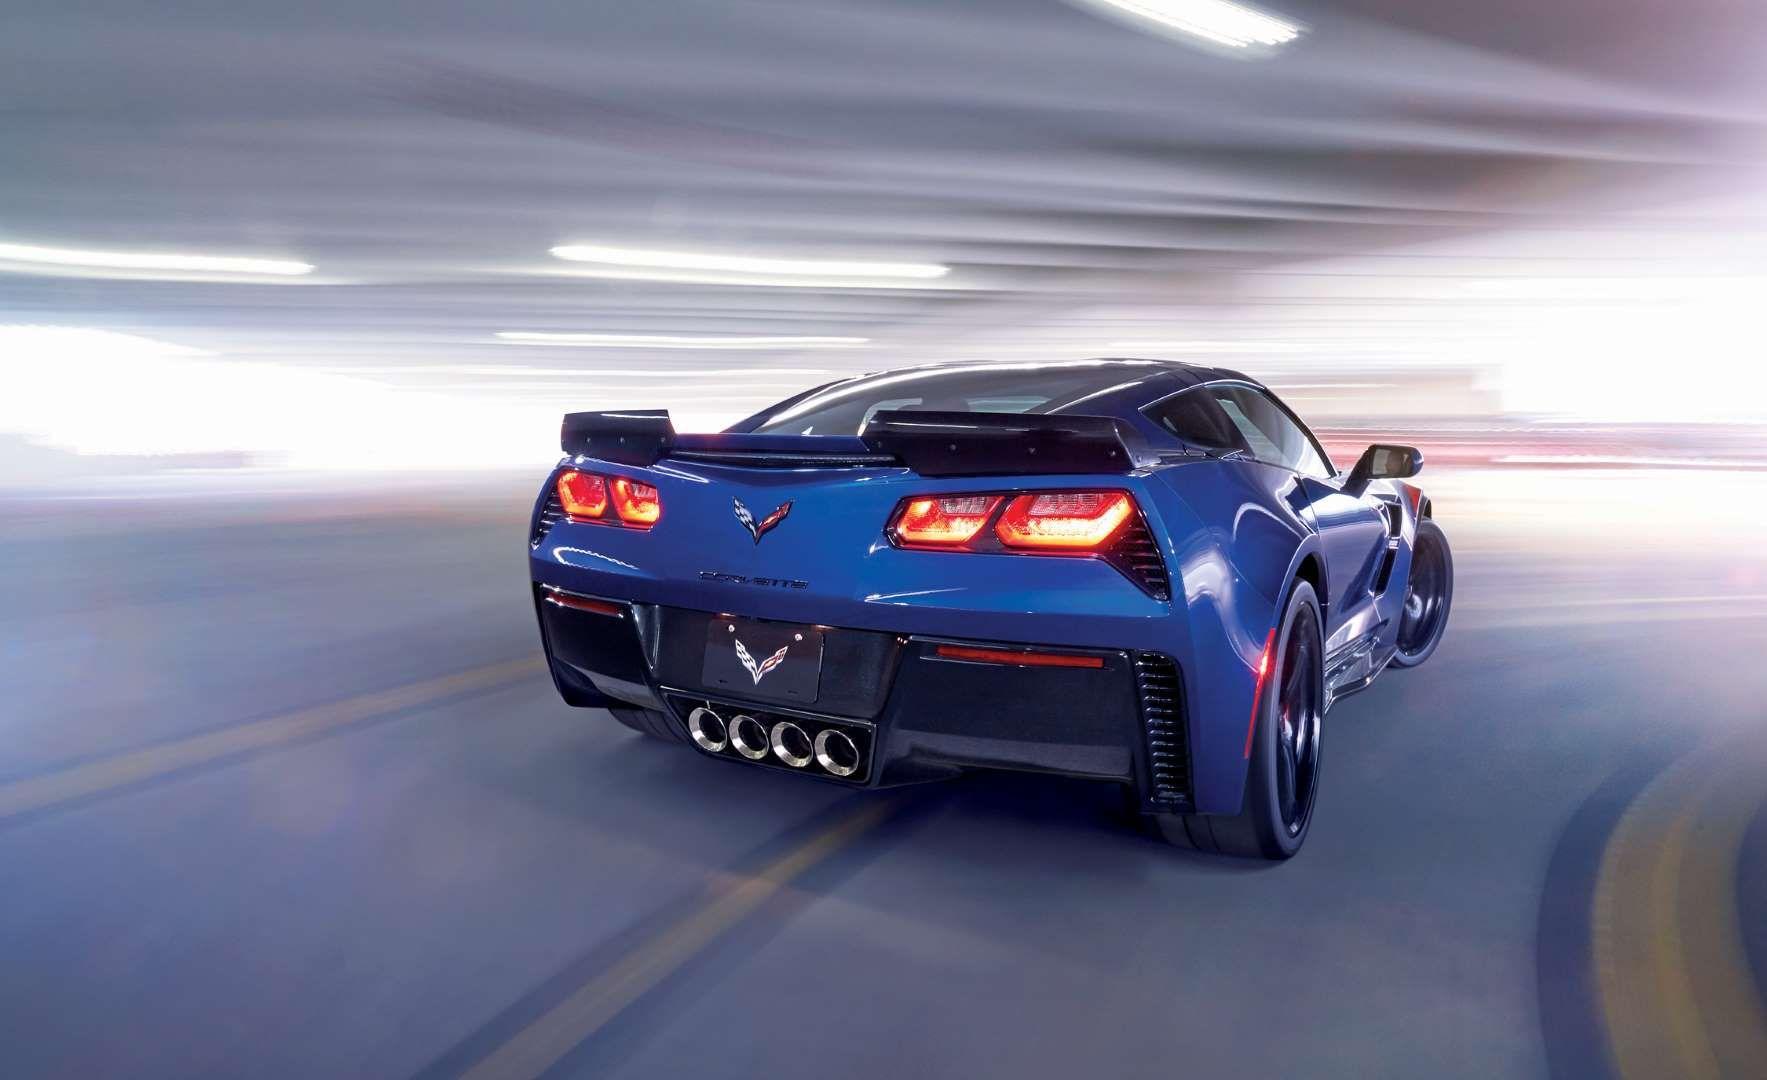 2017 corvette zora zr1 specs price autos concept - 2017 Chevrolet Corvette Grand Sport First Drive Review